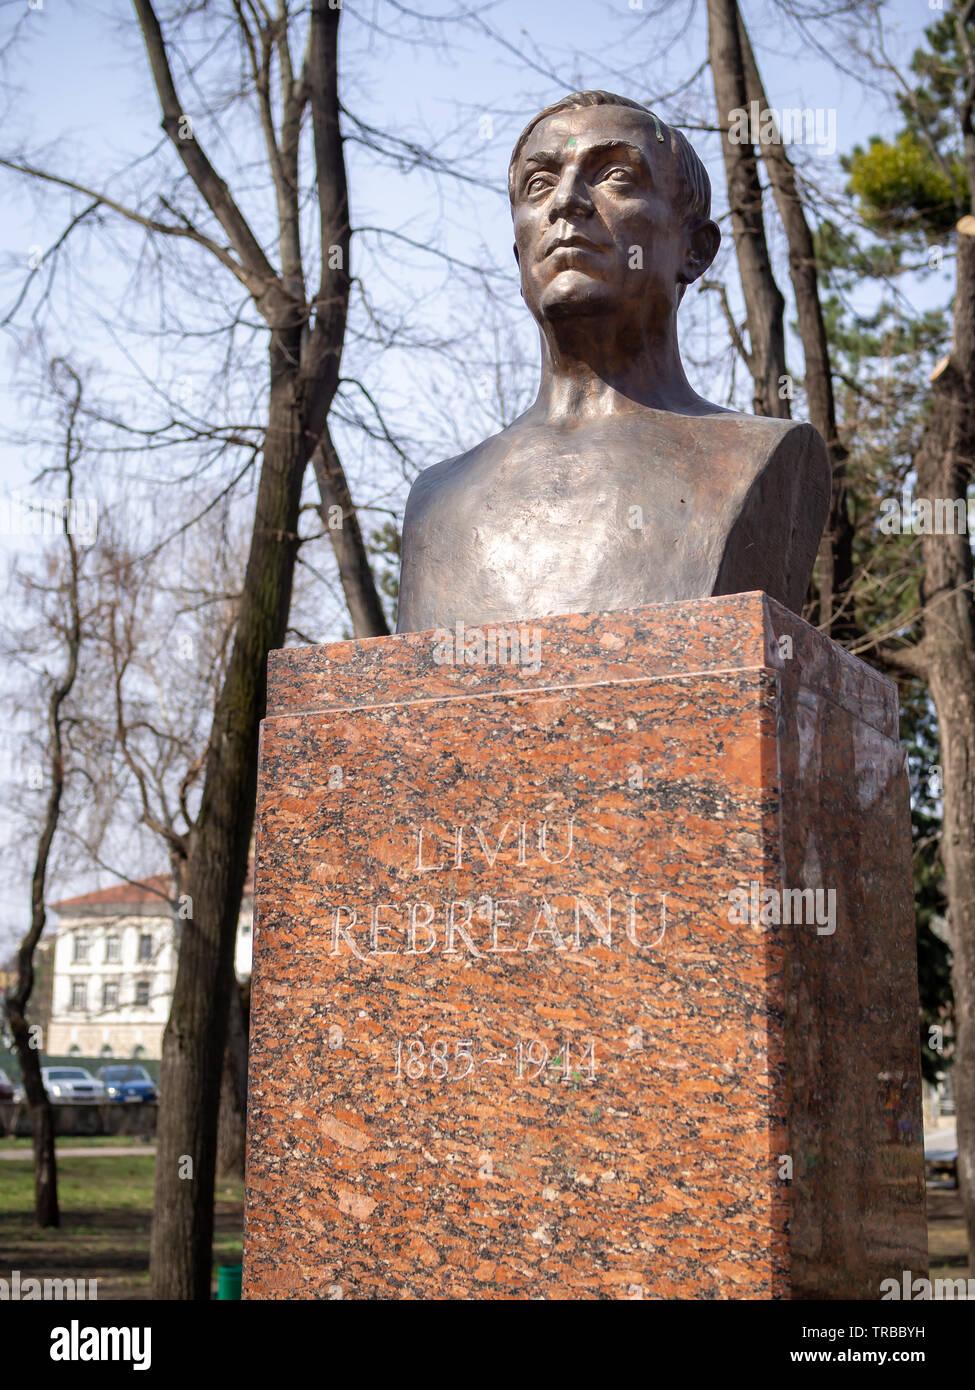 CHISINAU, MOLDOVA-MARCH 21, 2019: Liviu Rebreanu bust by Milita Patrascuin the Alley of Classics - Stock Image